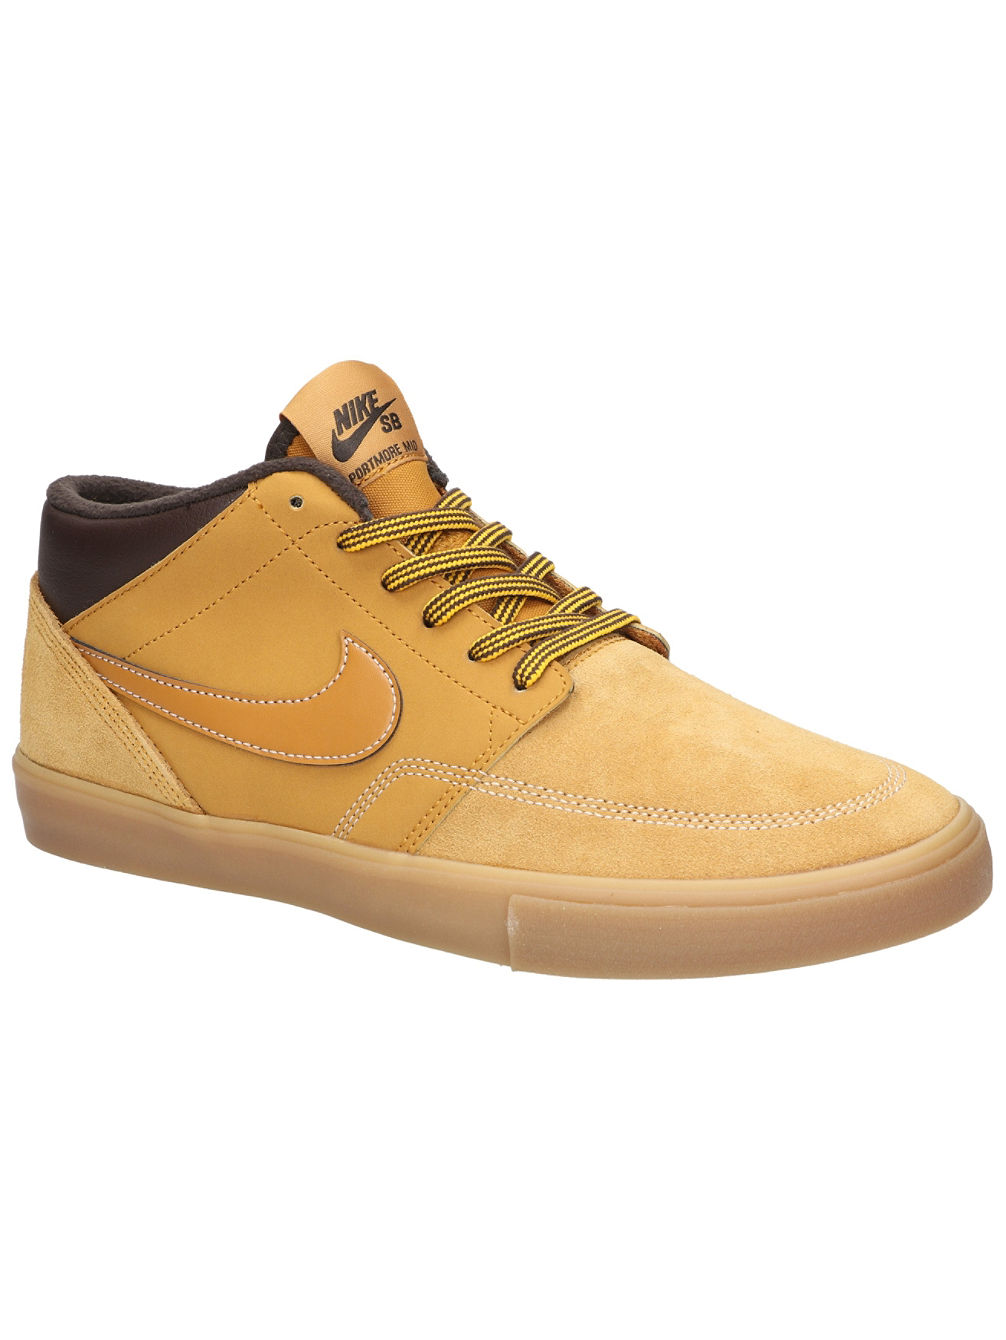 best sneakers 26d2b 207cb Nike SB Portmore II Solarsoft Mid Bota Winterschuhe online kaufen ...